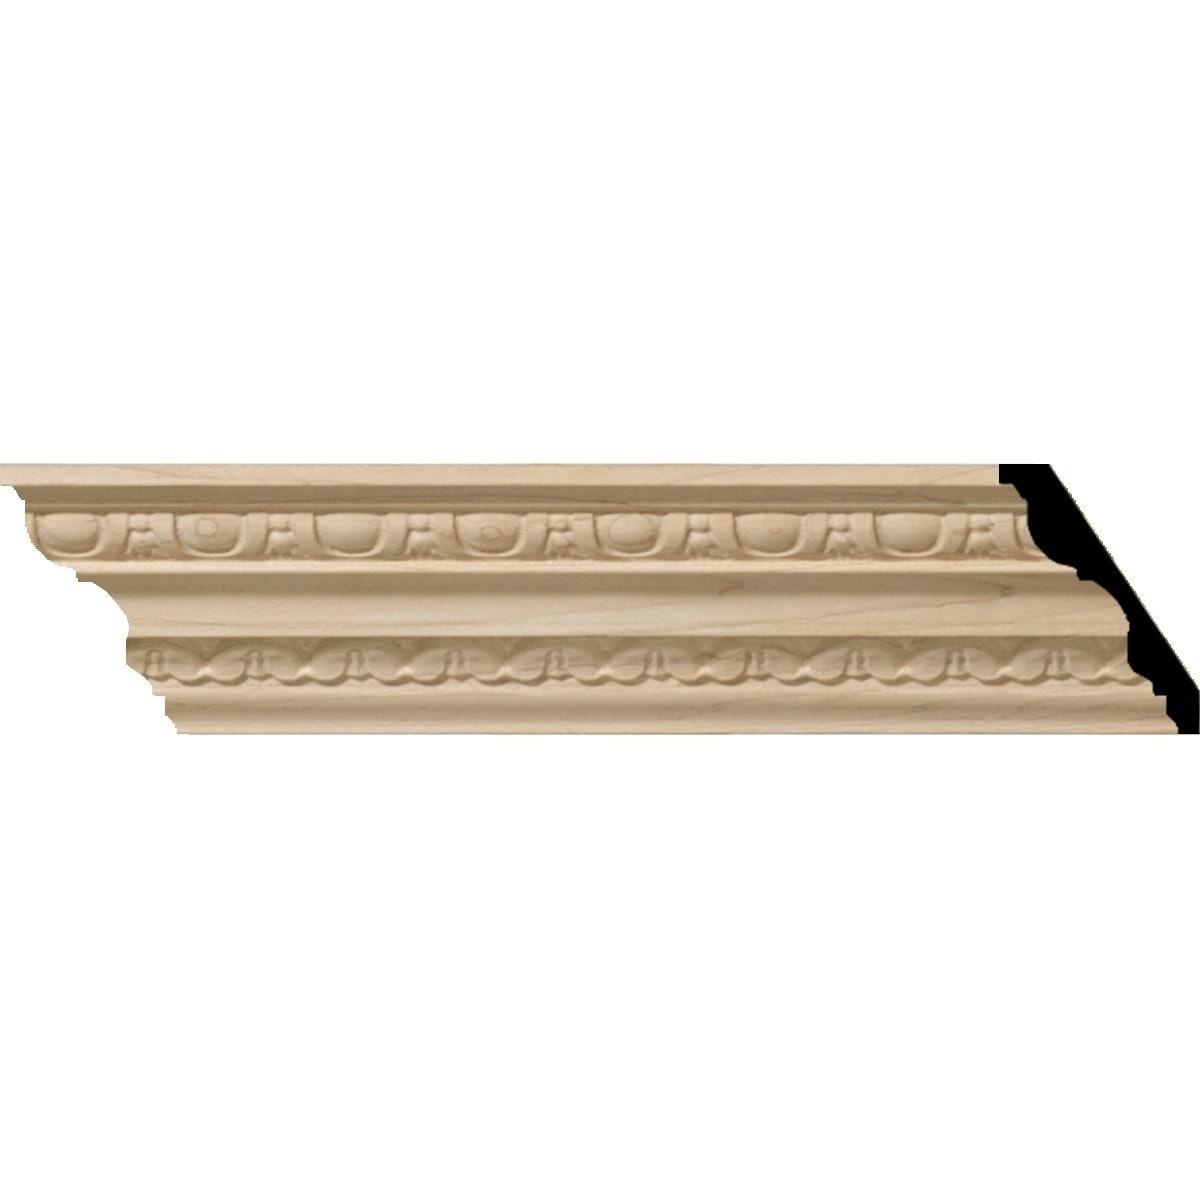 5 1/2H x 4P x 6 3/4F x 94 1/2L Bedford Wood Crown Moulding (Maple - 2-Pack)